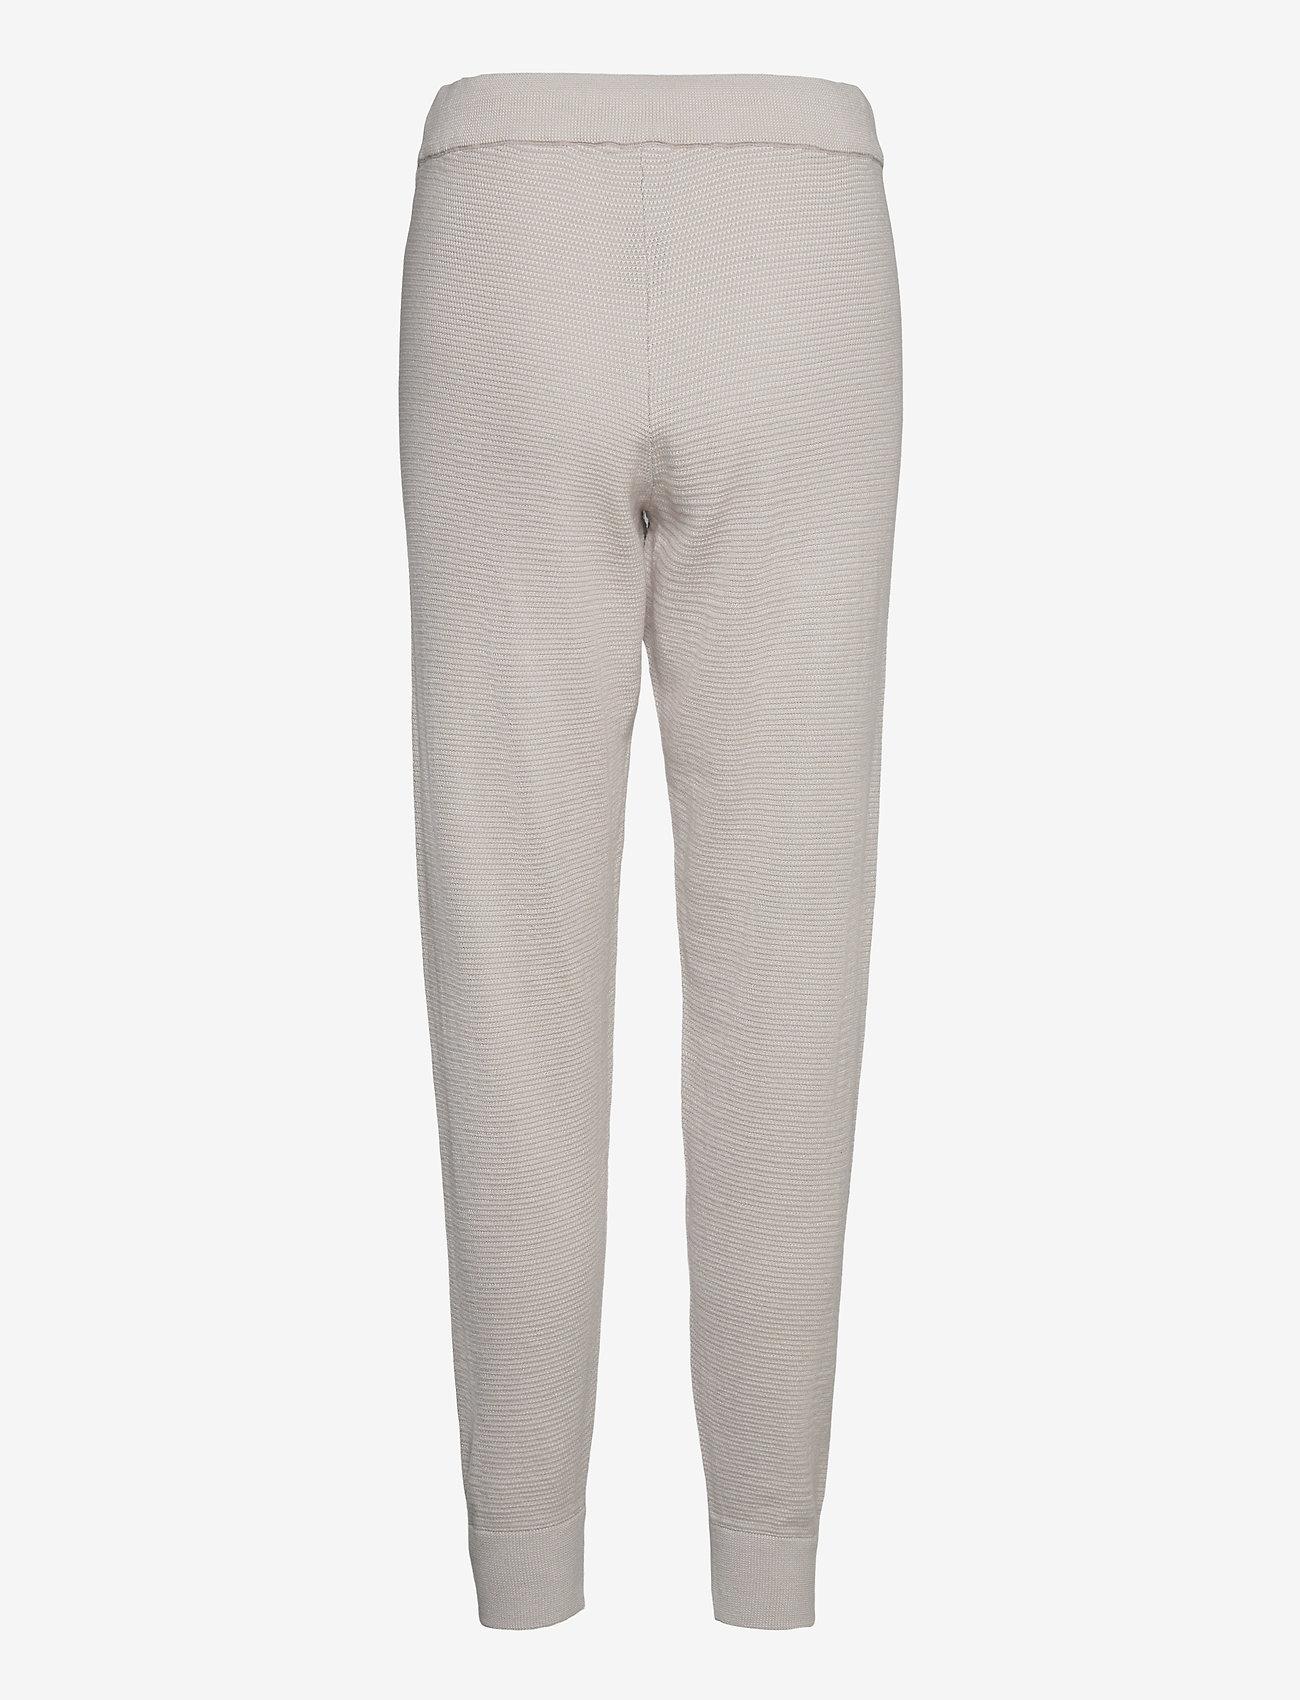 Varley - Alice Sweatpants 2.0 - kleidung - cobweb silver - 1